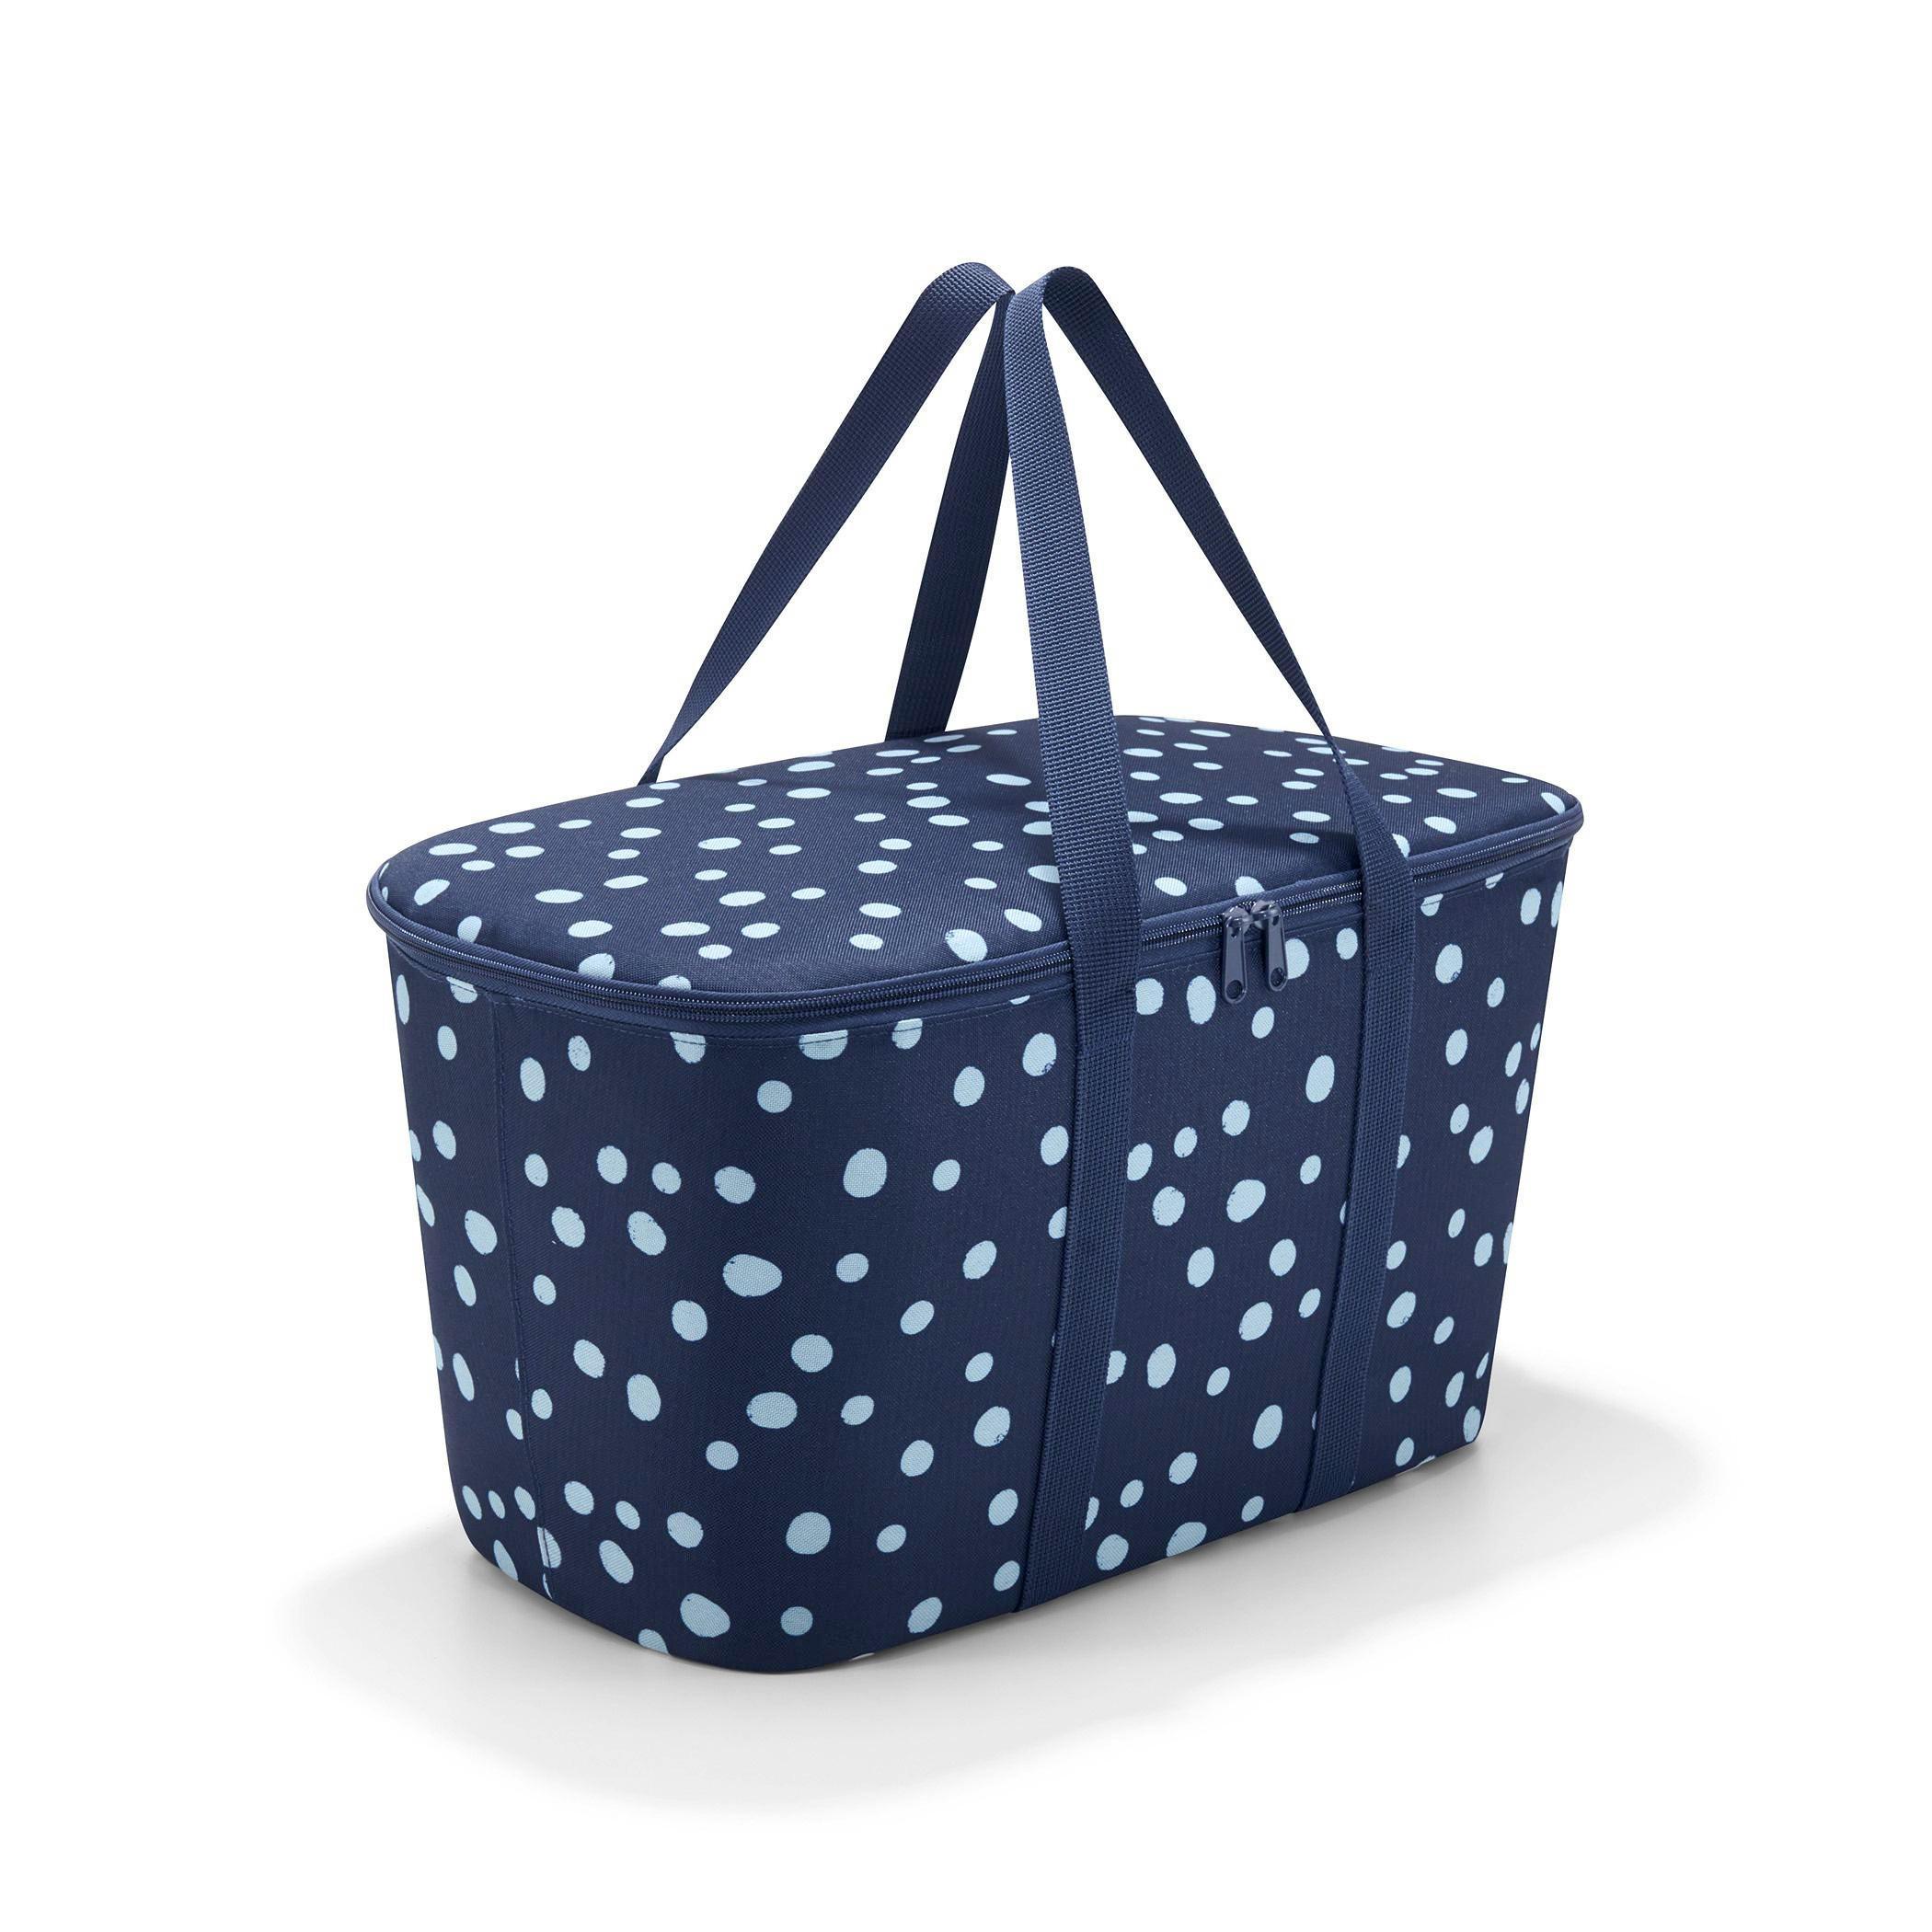 COOLERBAG SPOTS NAVY Blau - Blau, Textil (44,5/24,5/25cm) - REISENTHEL